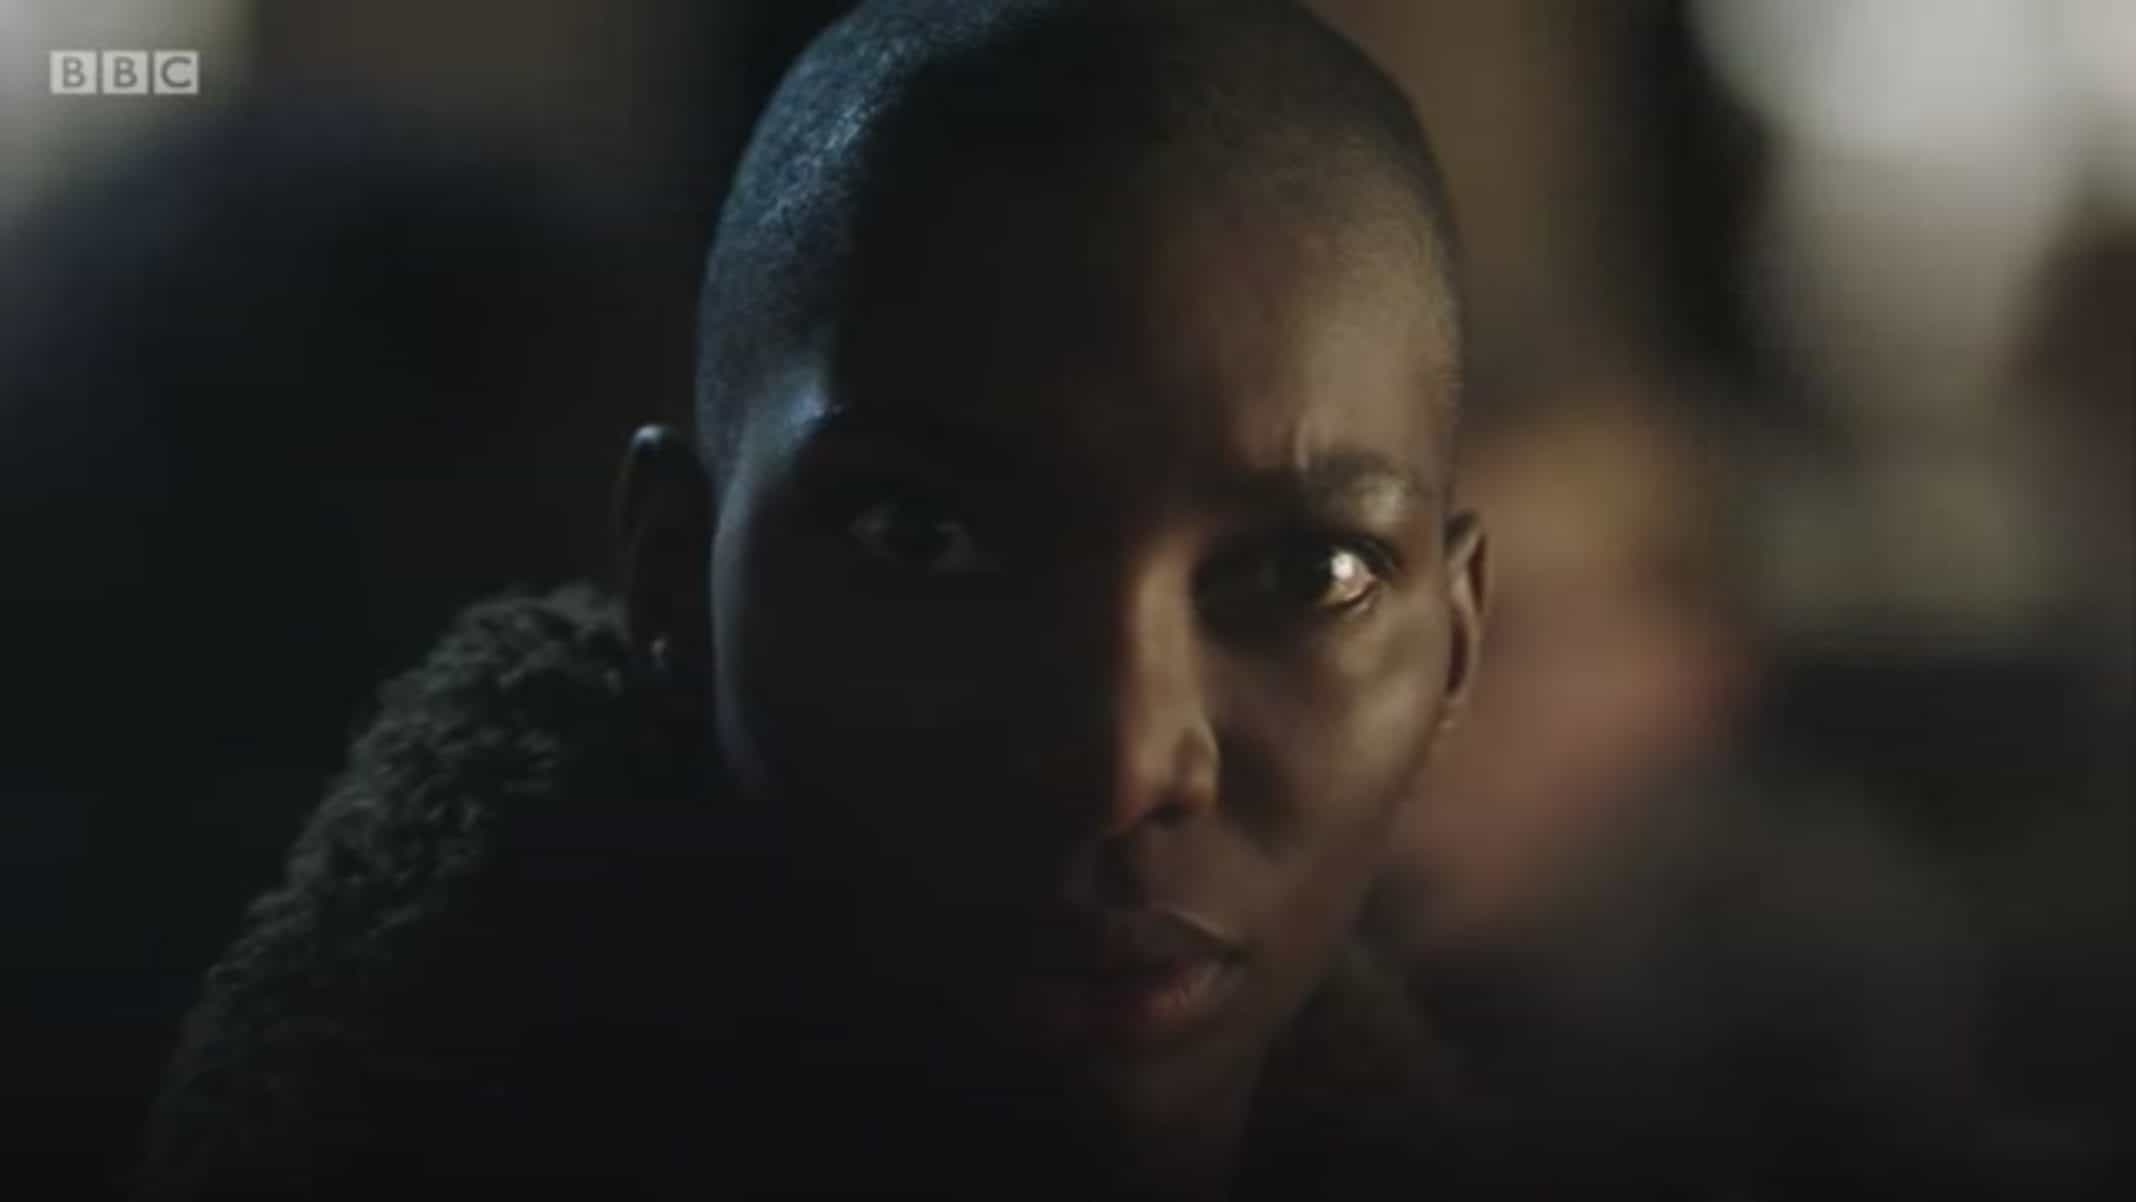 Arabella (Michaela Coel) recognizing her rapist and his accomplice.